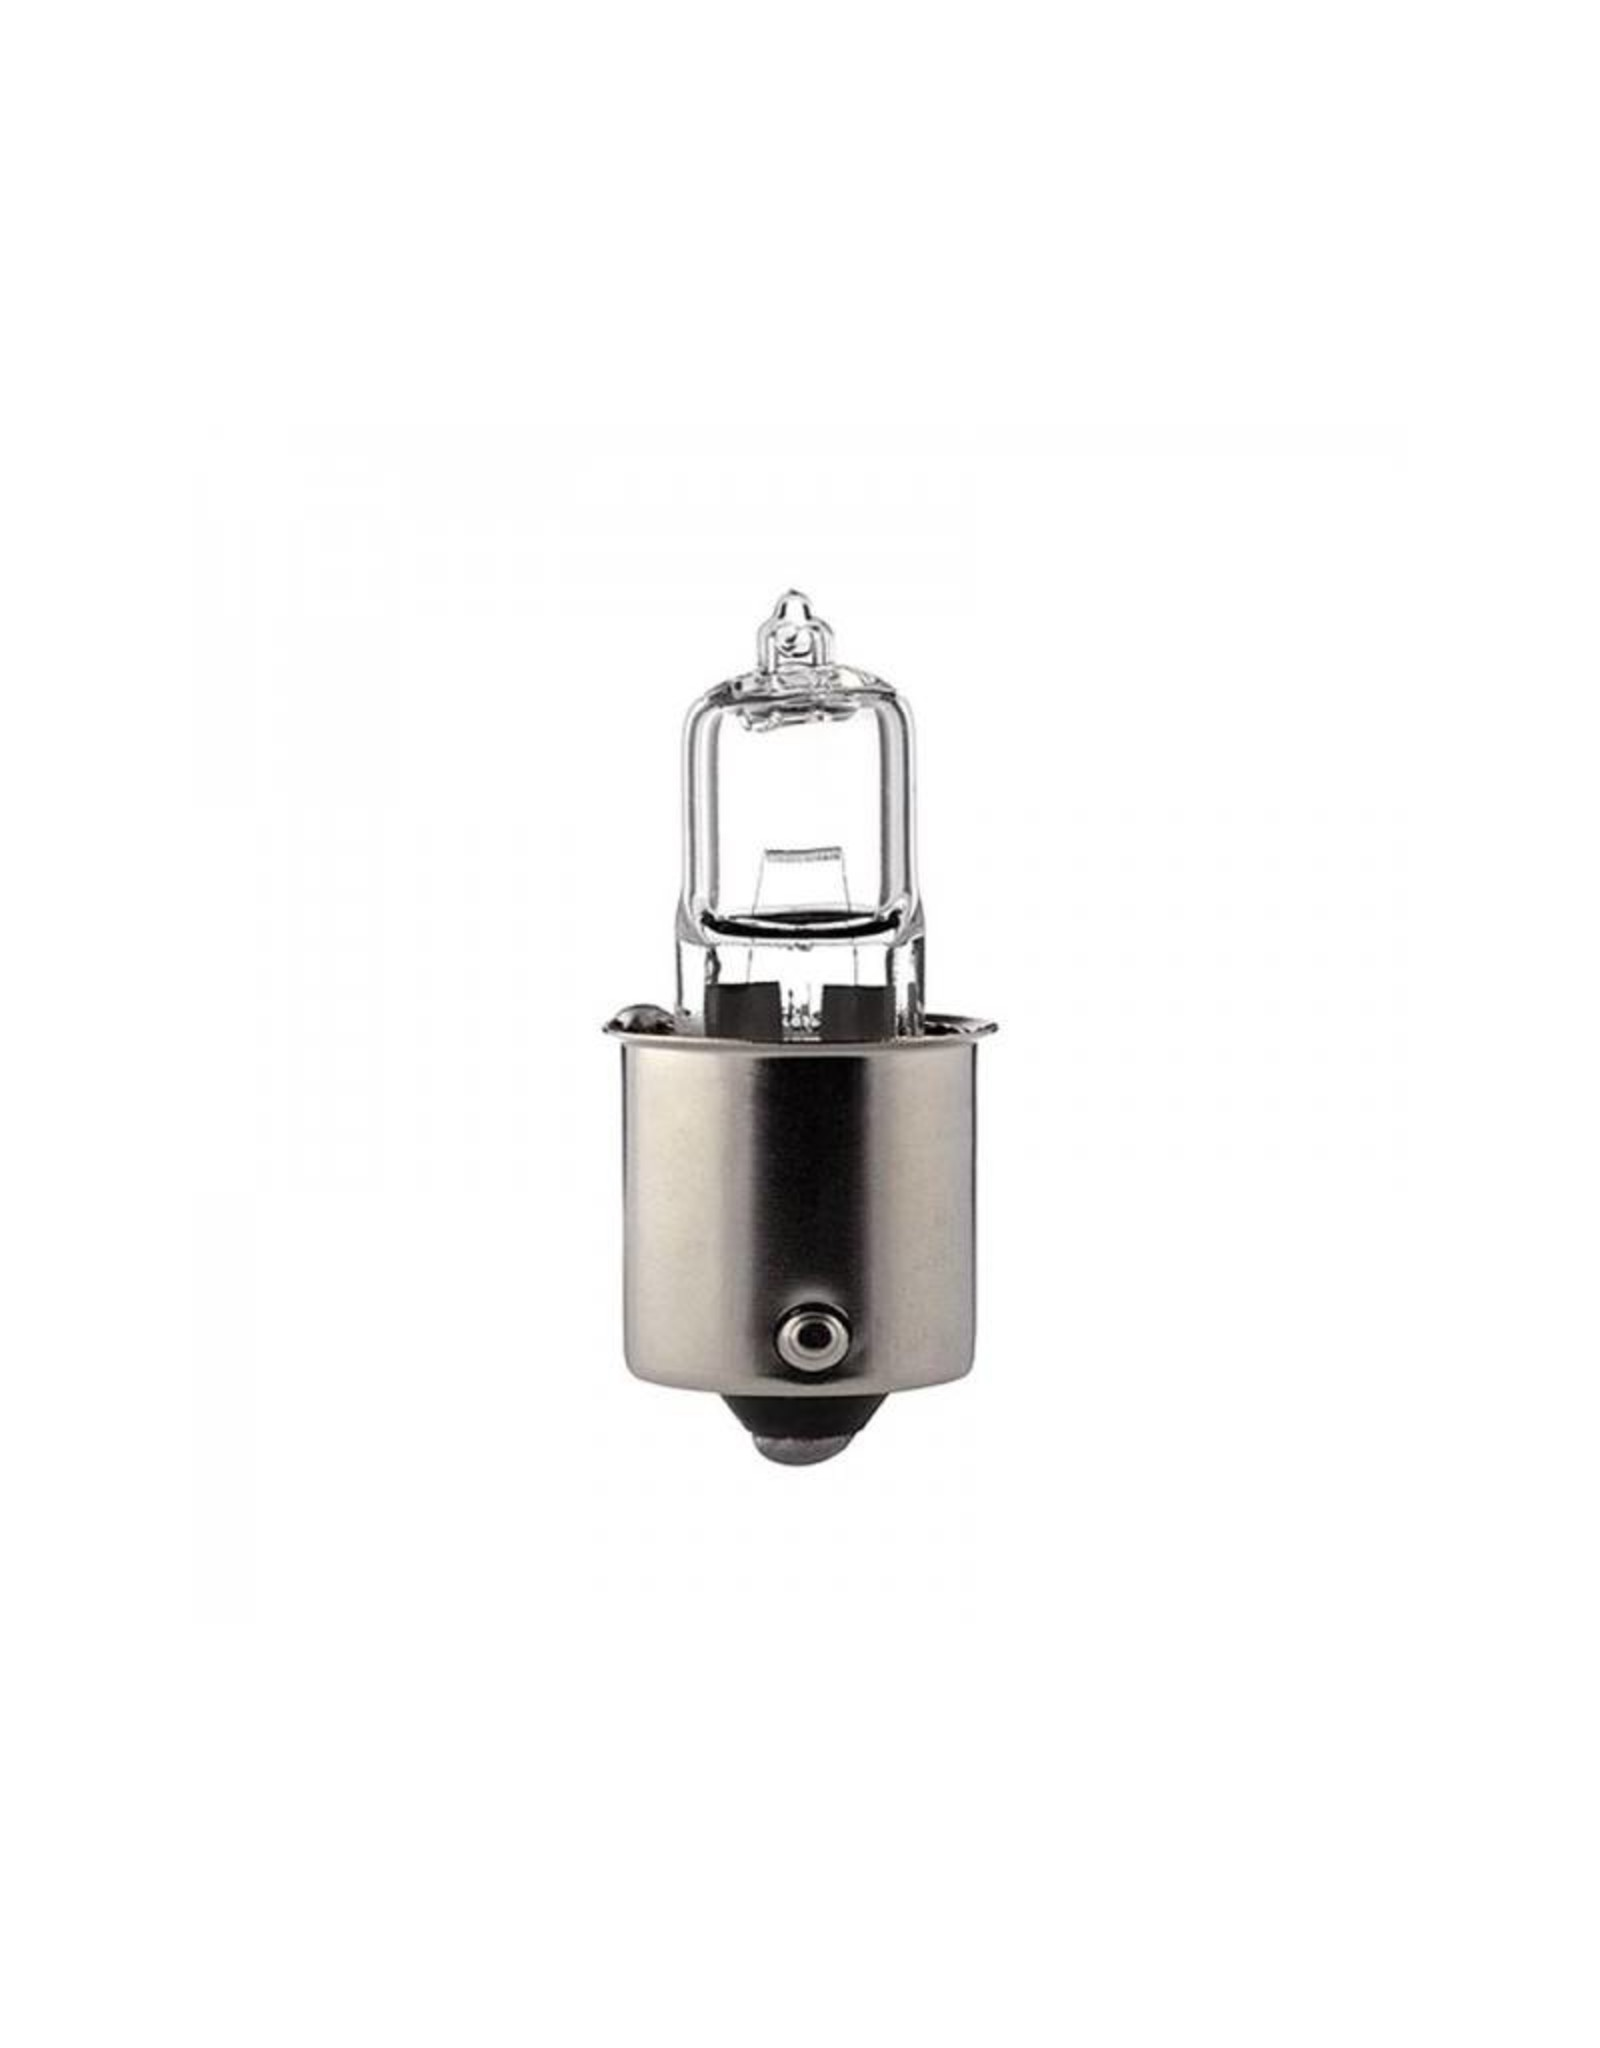 Halogeenlamp 12V 10W BA15s